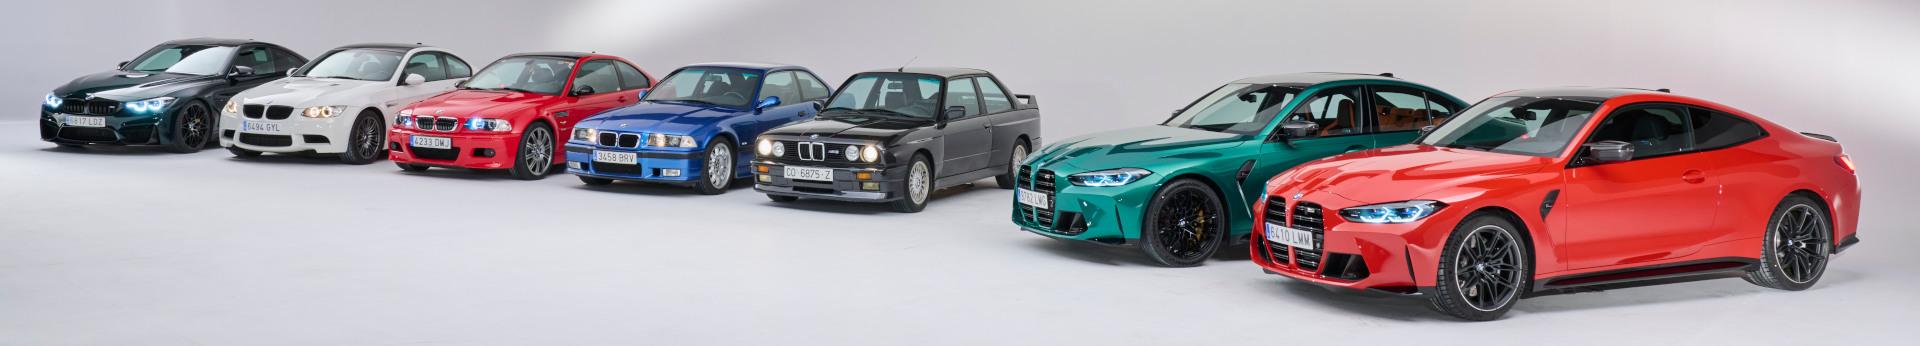 Name:  BMW-M3-M4-F82-E92-E46-E36-E30-G80-G82.jpg Views: 4504 Size:  162.3 KB